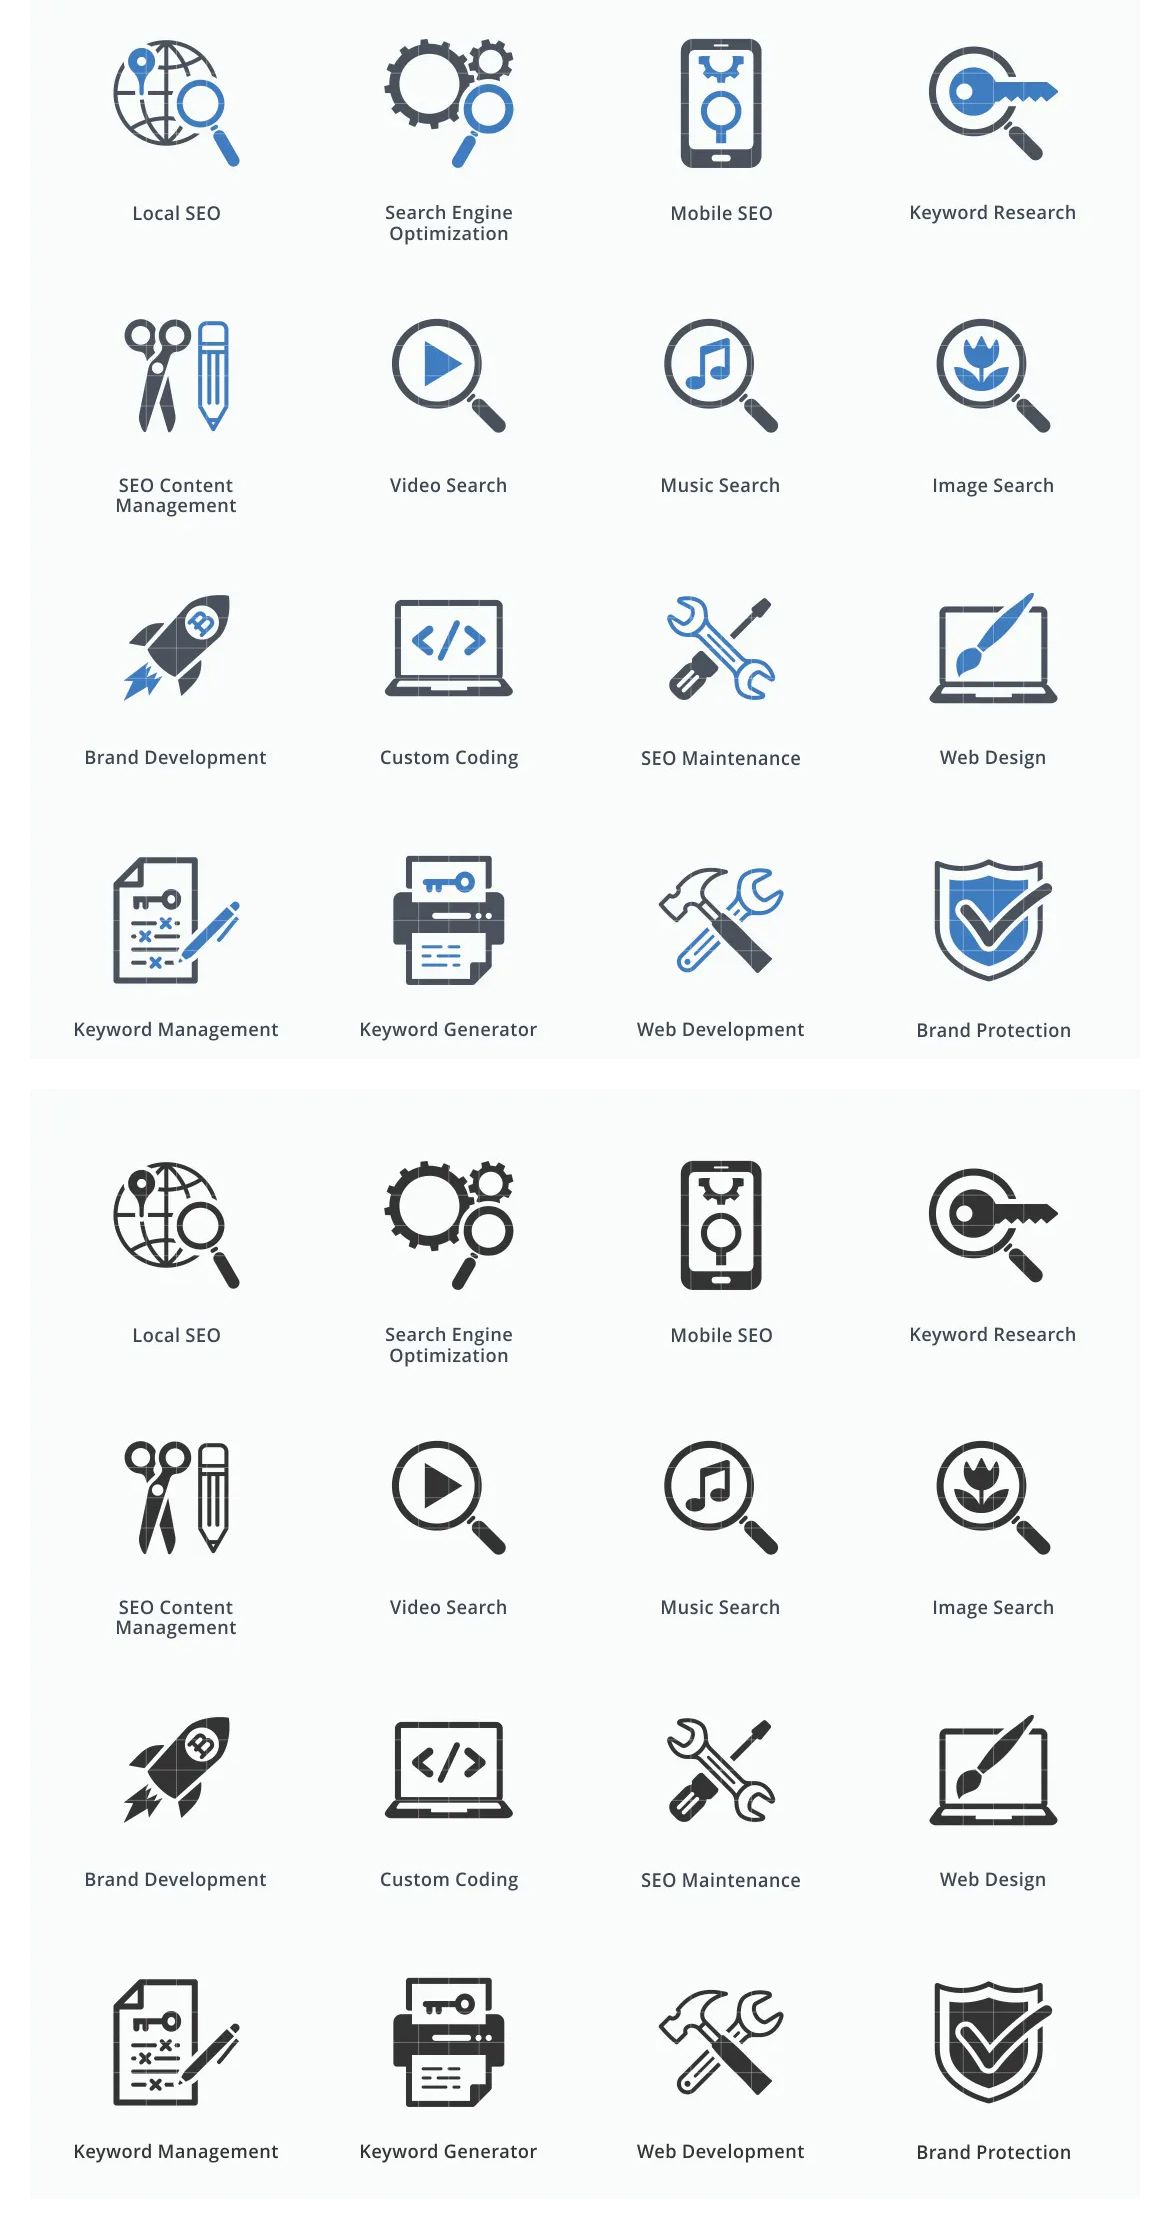 Seo Internet Marketing Icons Set 1 Blue Series By Introwiz1 On Marketing Icon Internet Marketing Icon Set